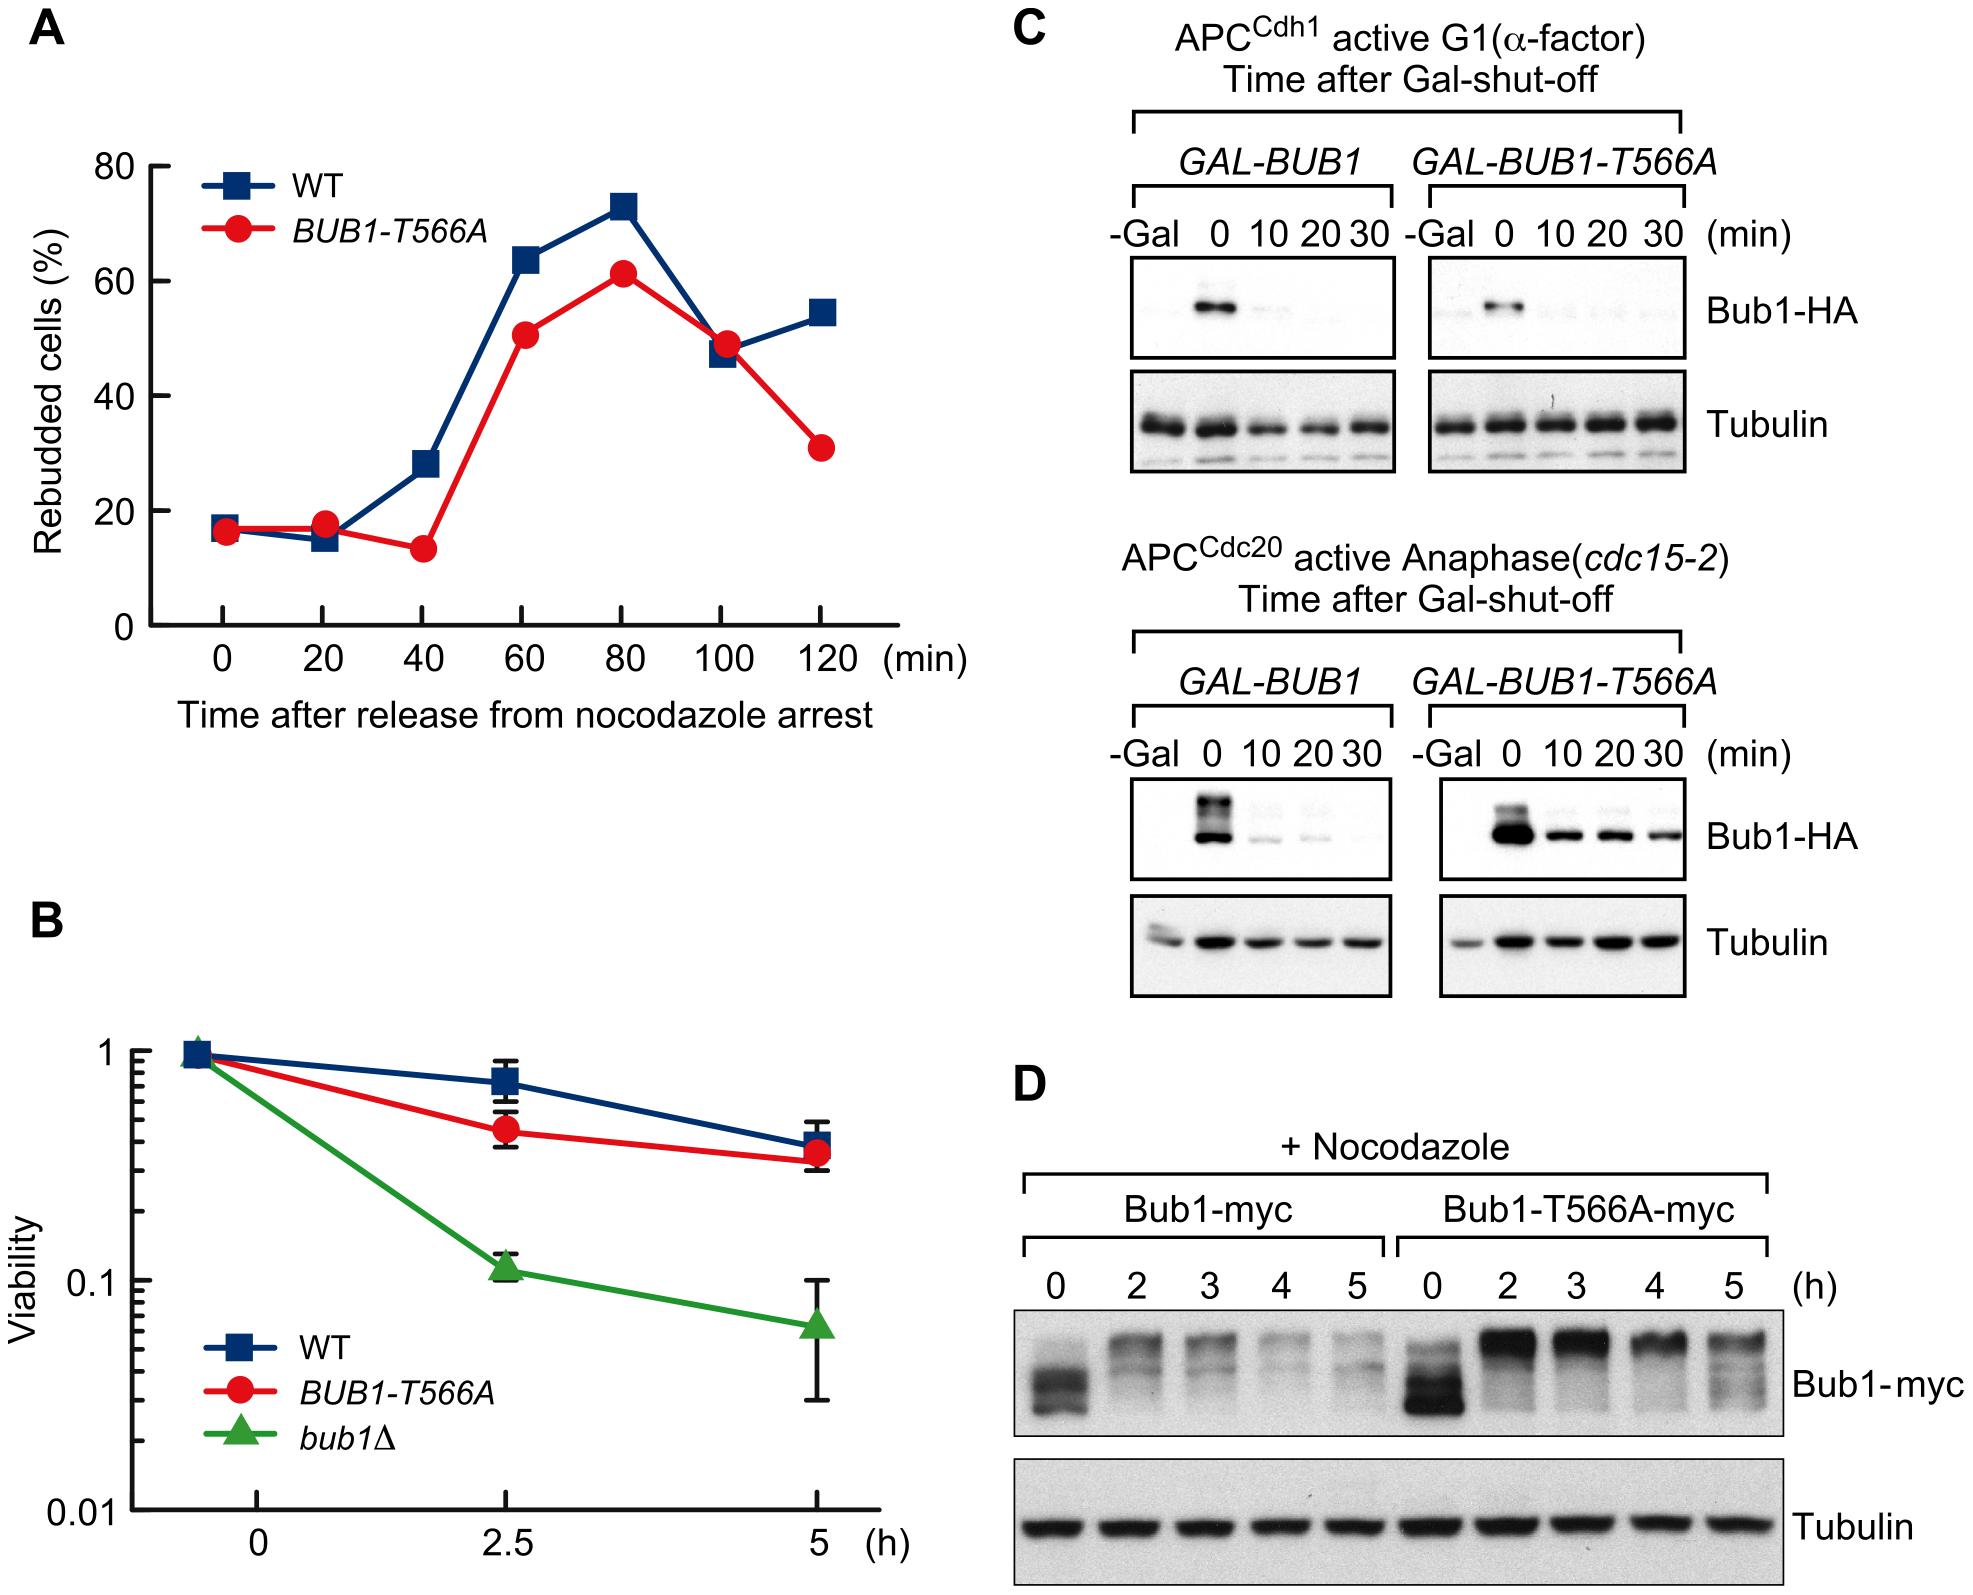 T566 phosphorylation affects Bub1 stability.